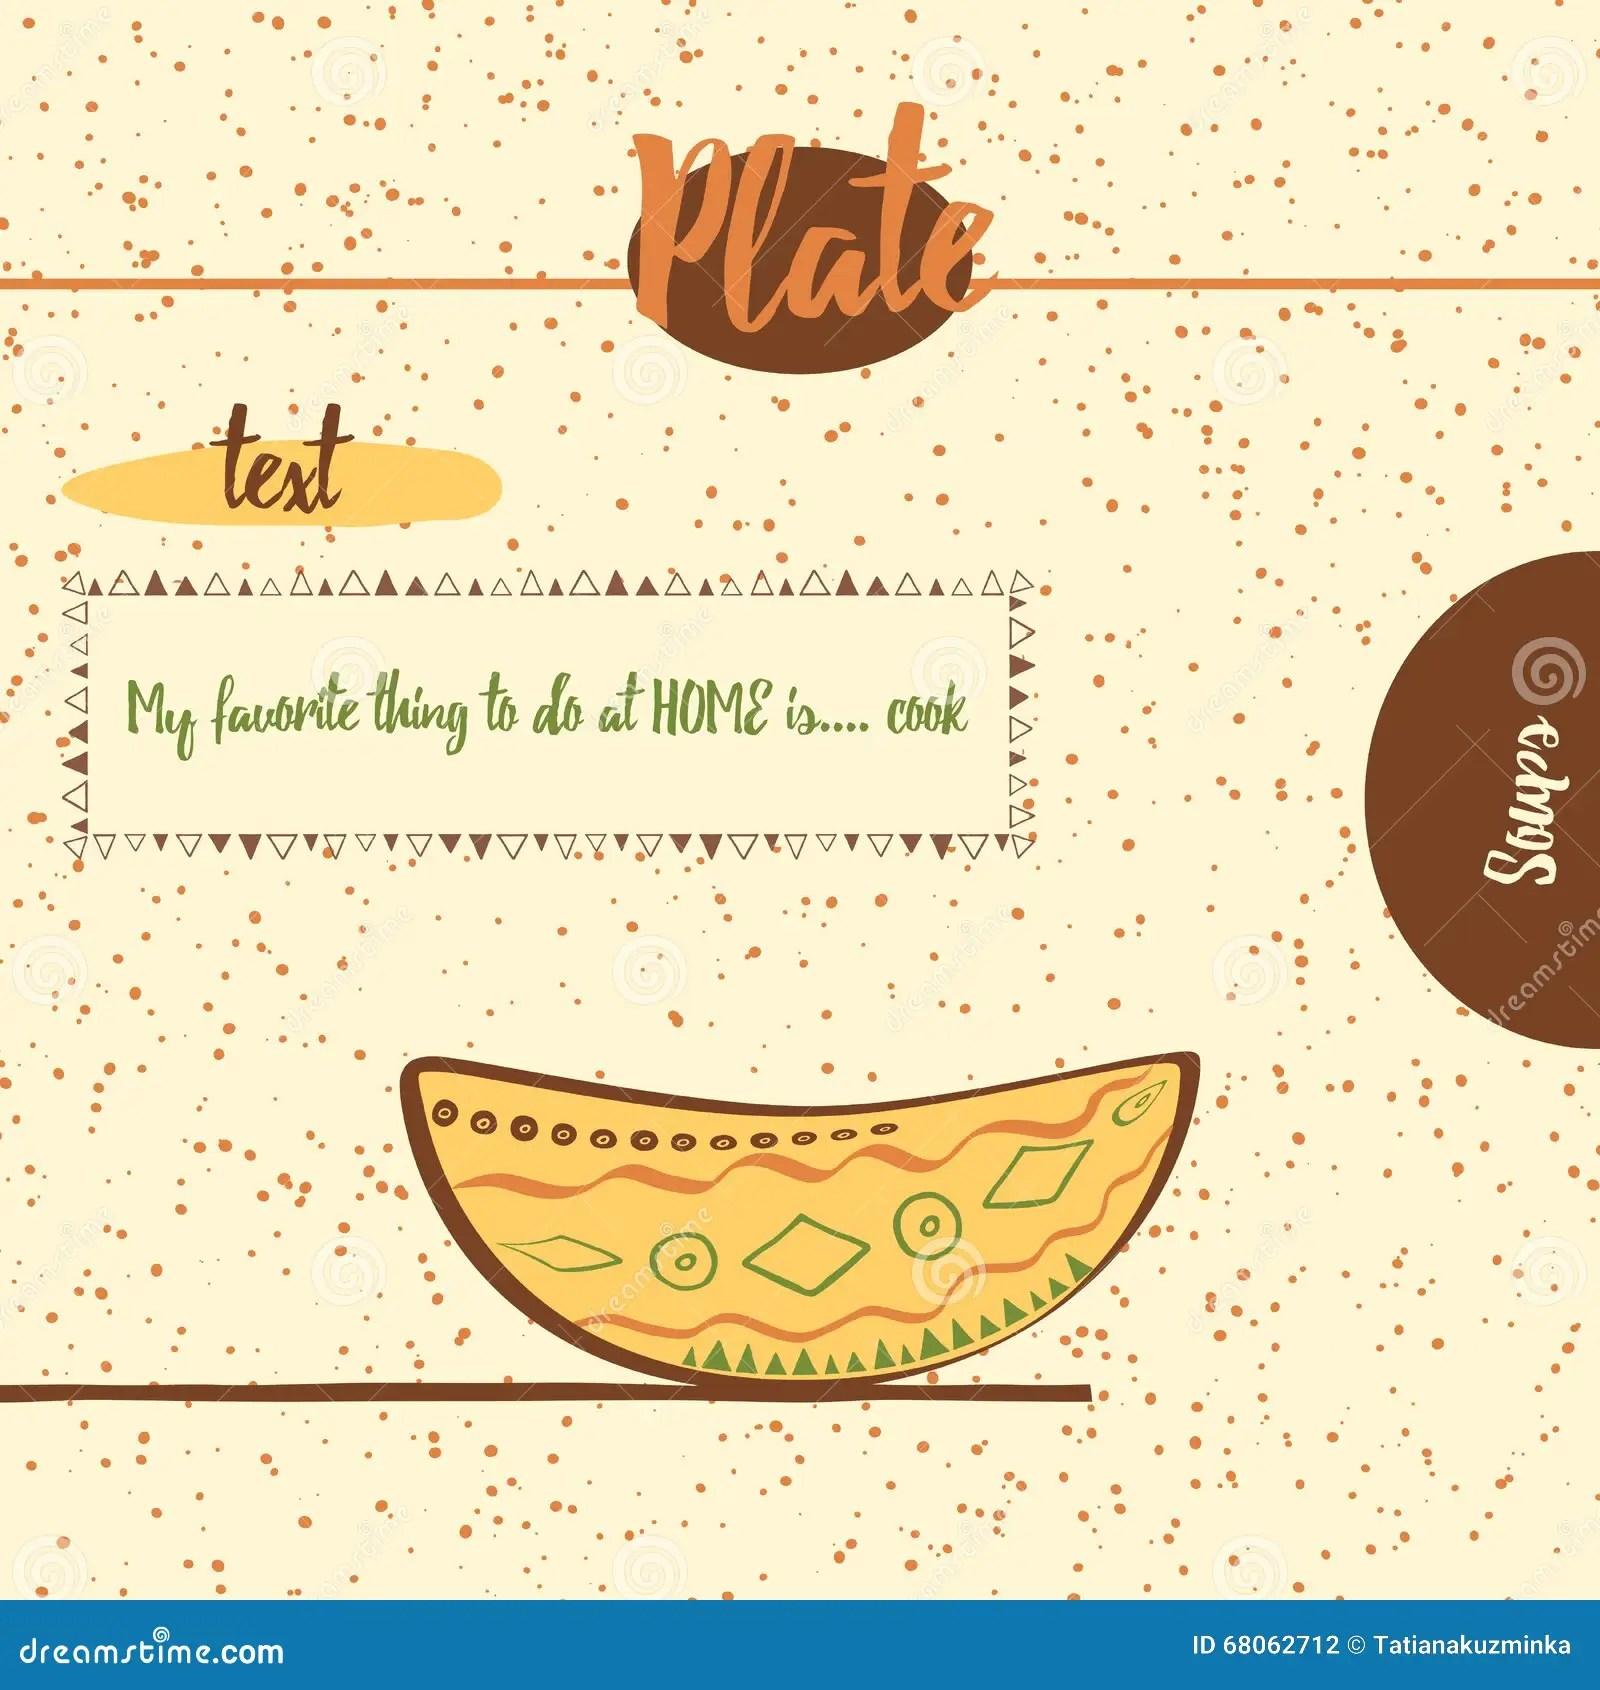 framed prints for kitchens kitchen remodeling sacramento 无缝的厨房样式用画在架子的手逗人喜爱的黄色碗库存例证 插画包括有线路 递在架子的画的逗人喜爱的黄色板材与在乱画样式做的碗的厨房背景与地方的网模板文本的和关于厨师或汤的富启示性的状态框架